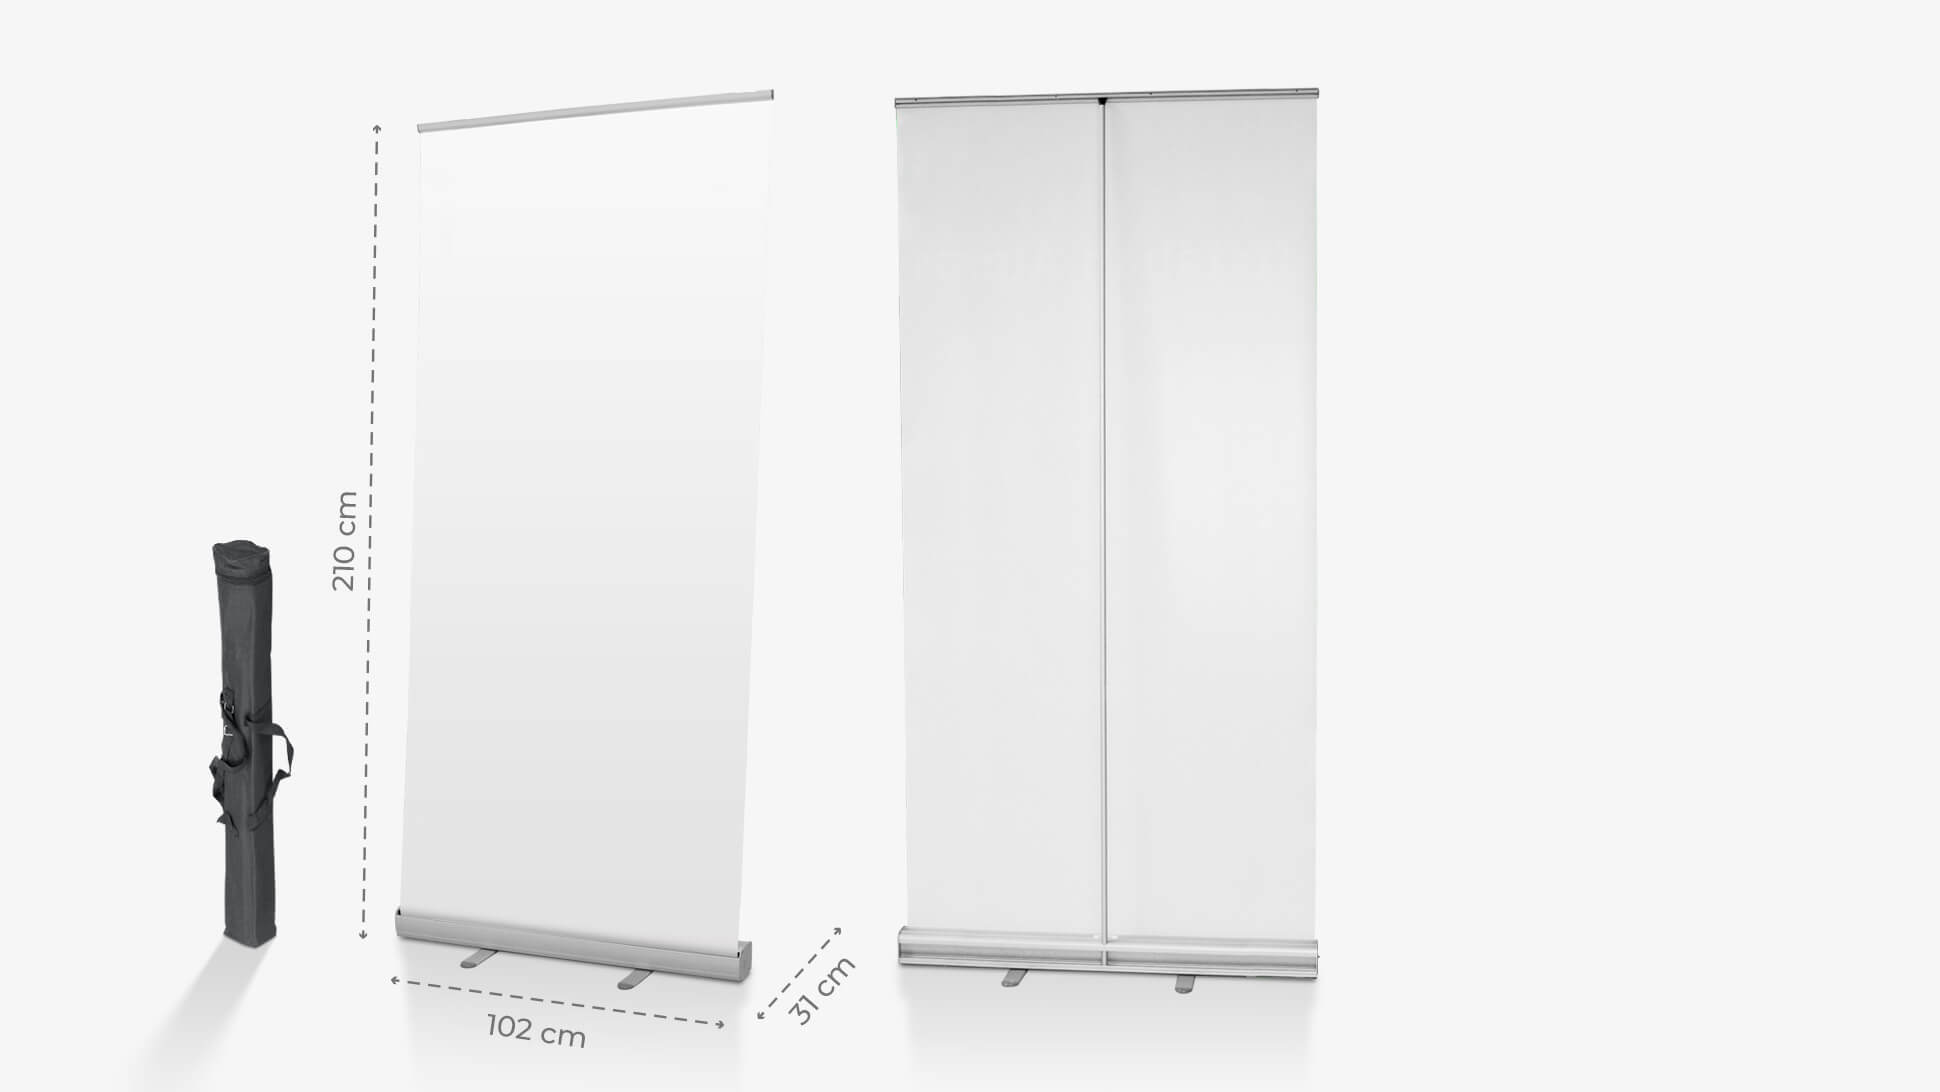 Rollup avvolgibile base 100 cm per allestimenti stand | tictac.it